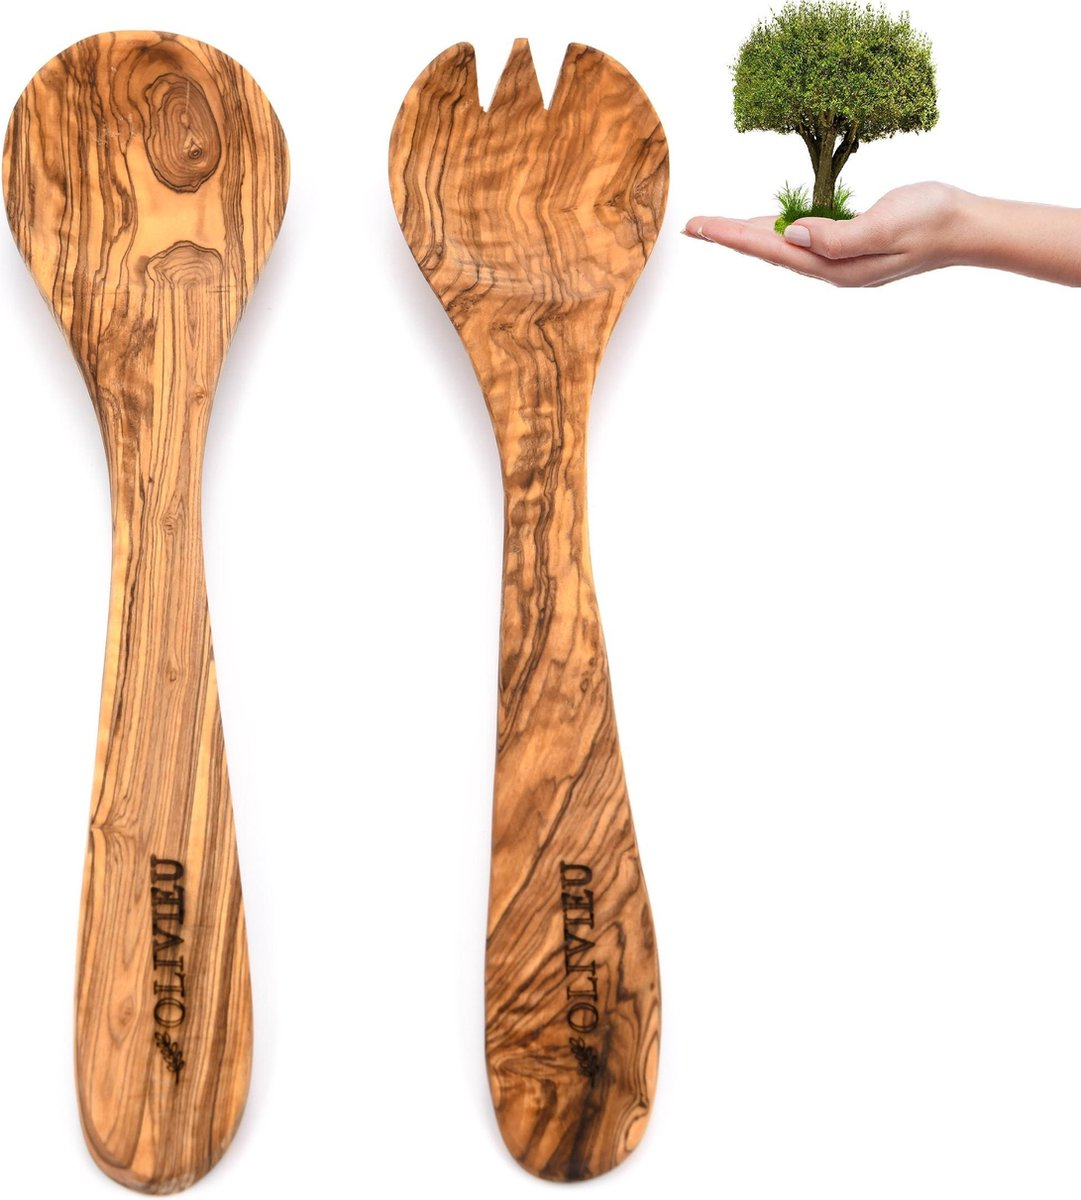 OLIVIEU   Hygi nisch Duurzaam Olijfhouten Slabestek   30 cm   Slacouvert   Saladebestek Hout   Sla b